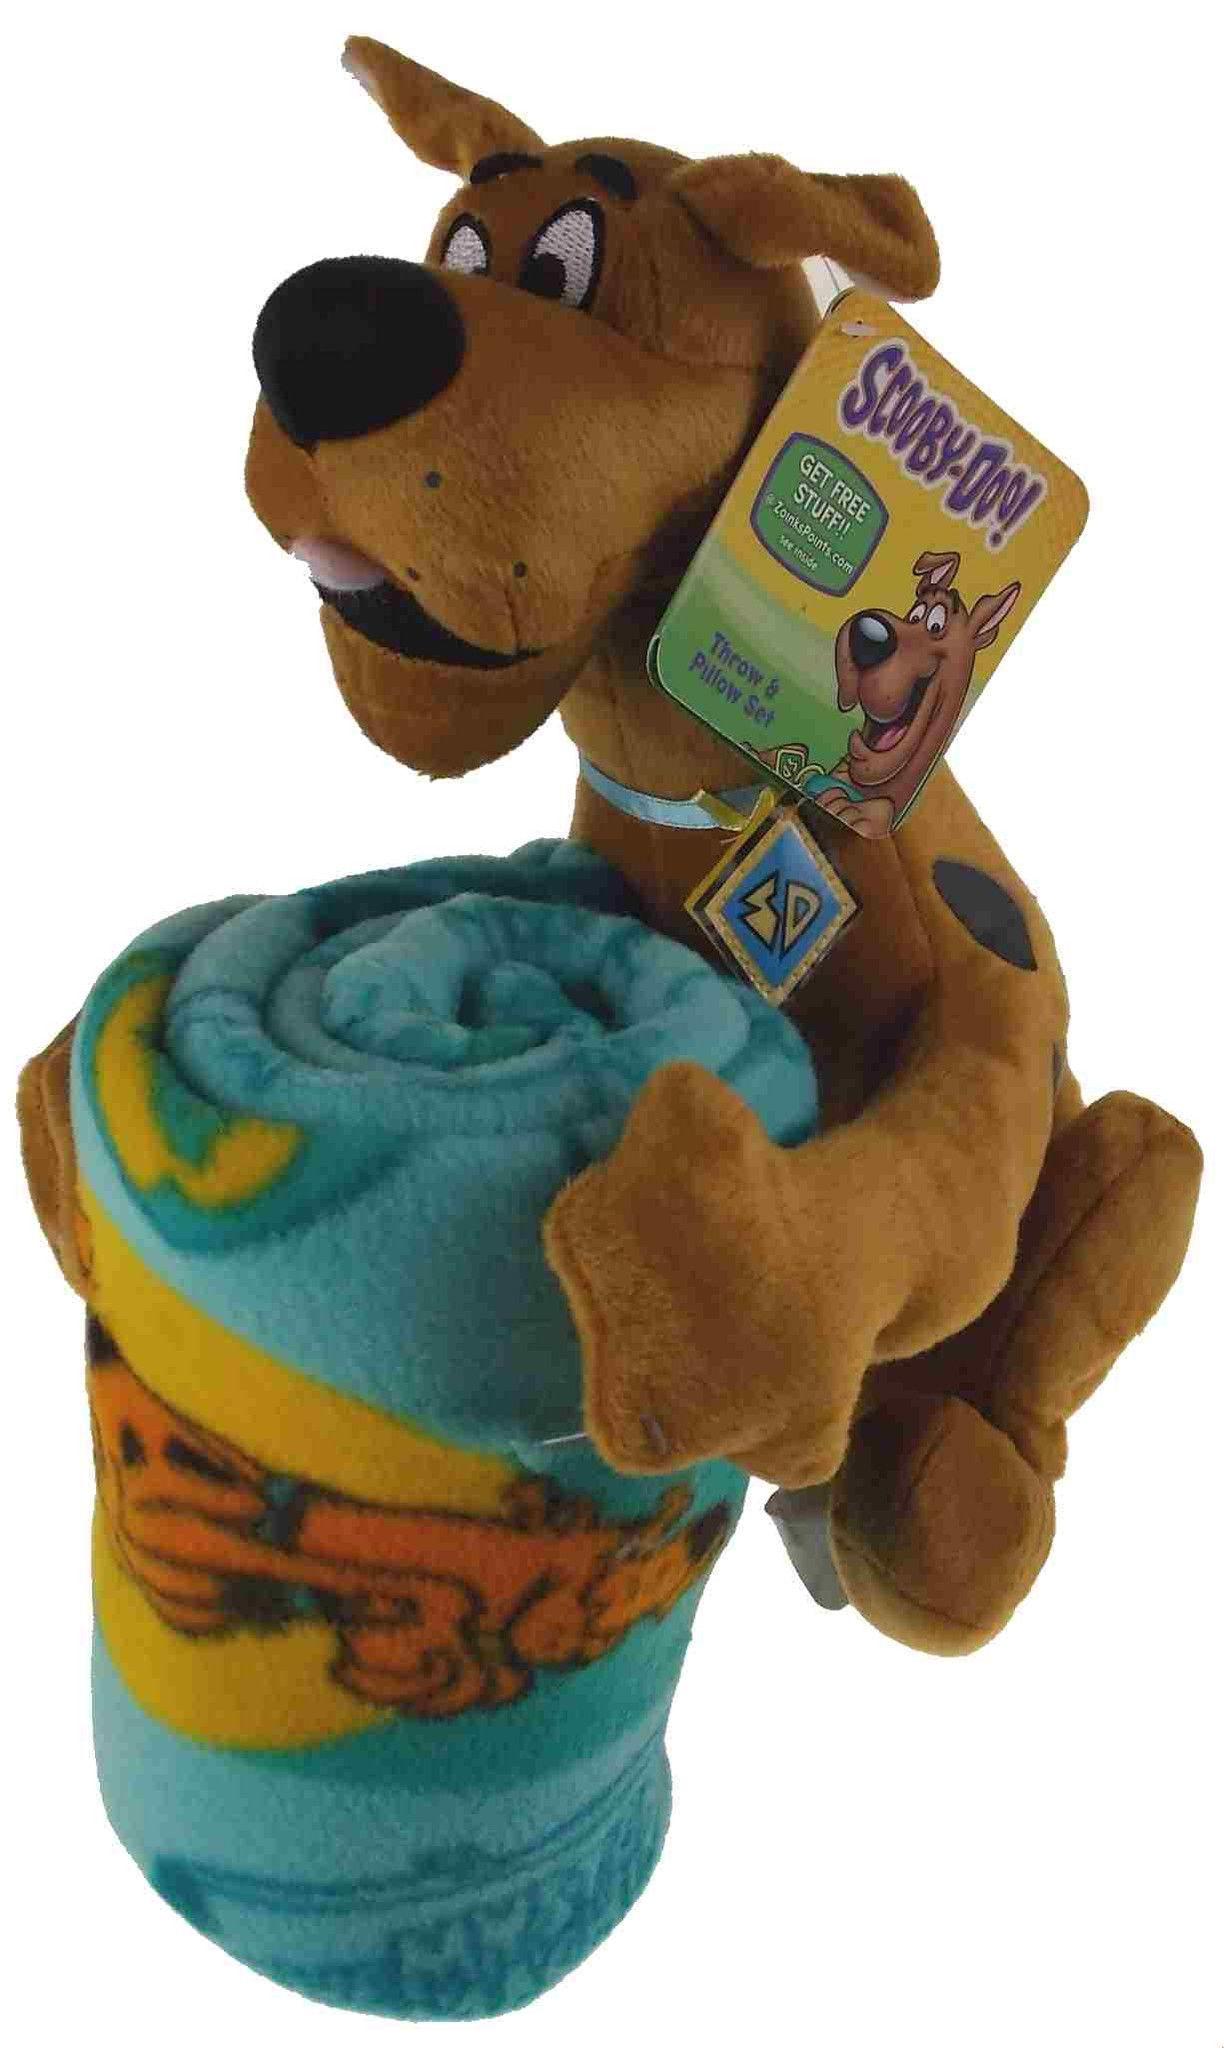 scooby doo throw pillow set hugger plush blanket soft stuffed